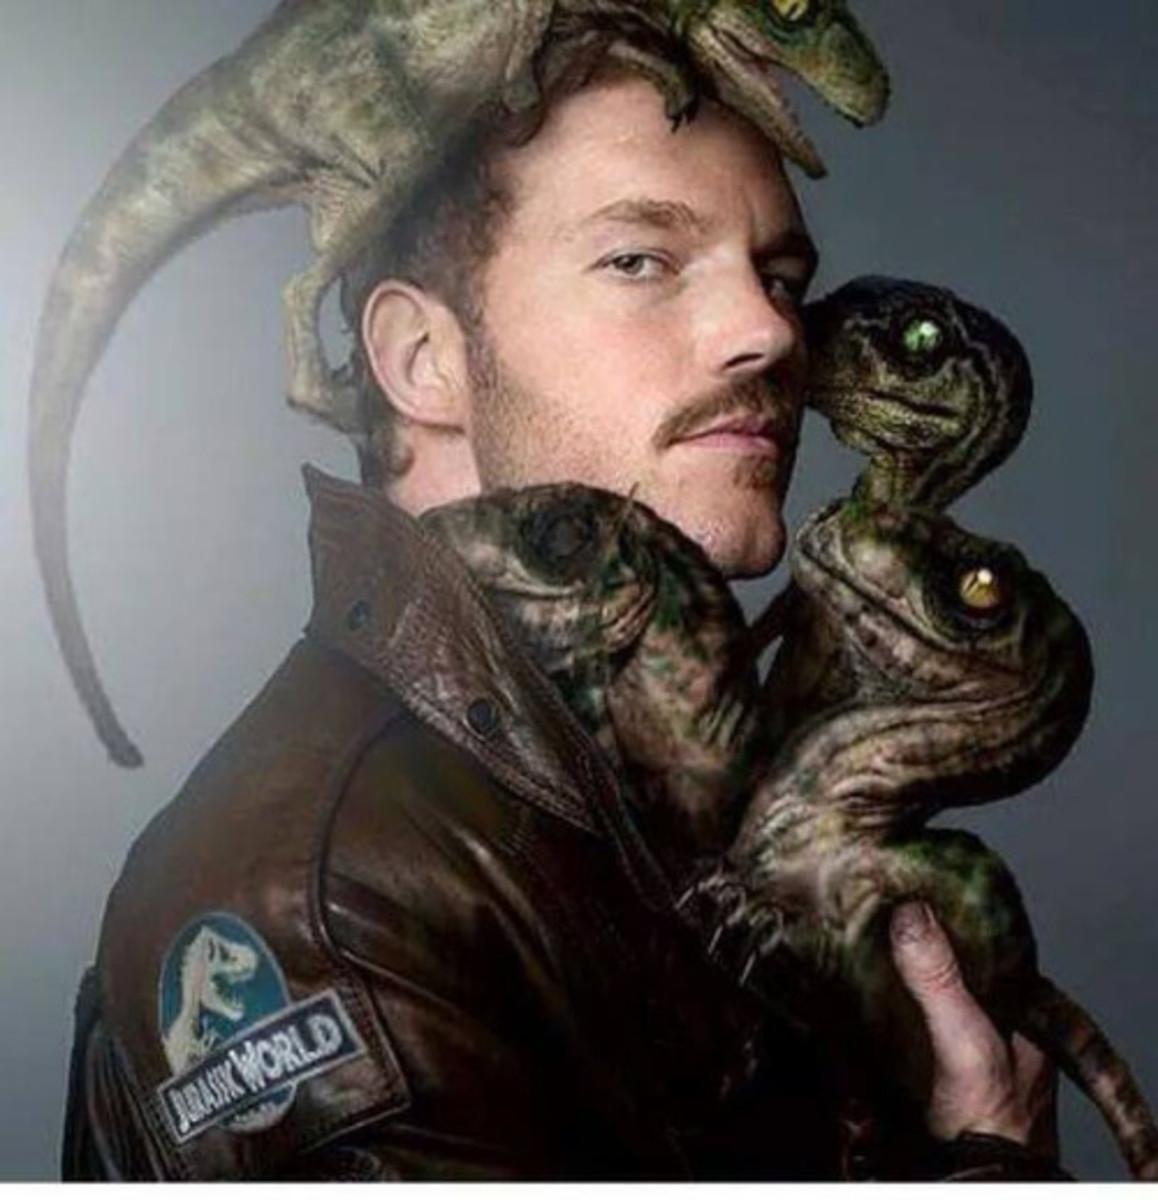 Chris Pratt and his raptor brood via Photoshop